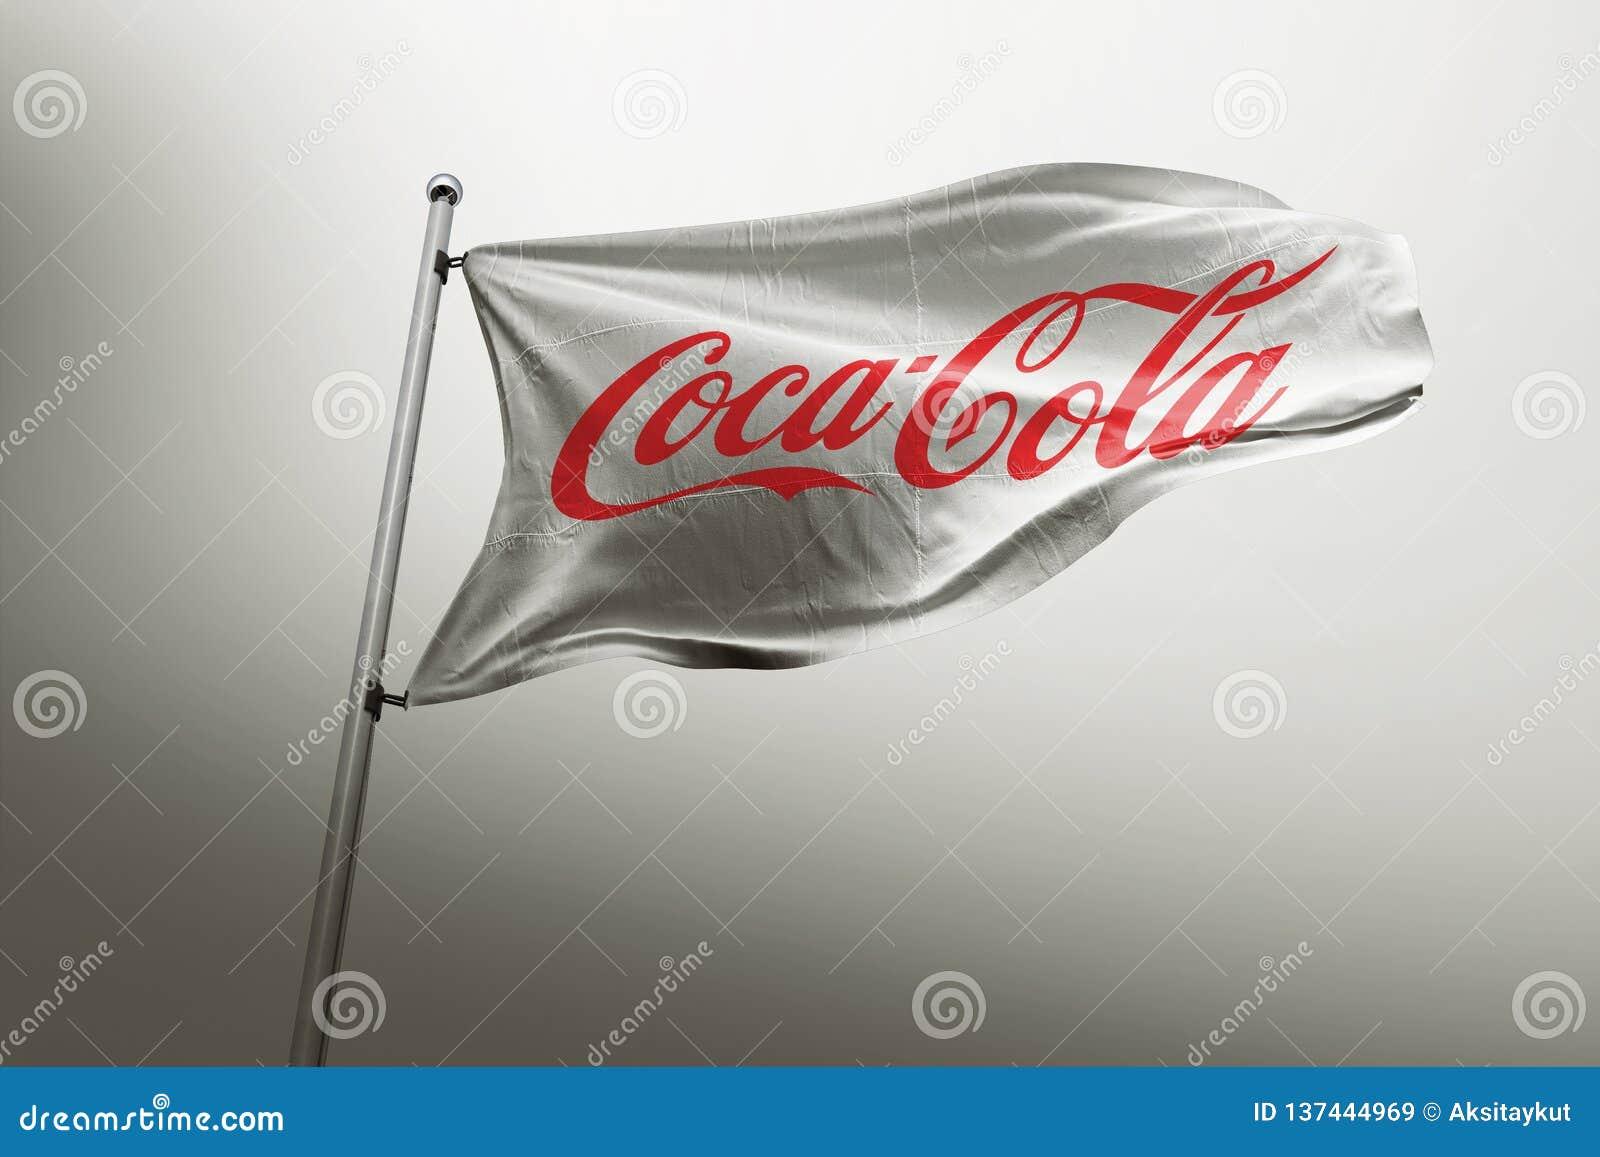 Coca cola photorealistic flag editorial